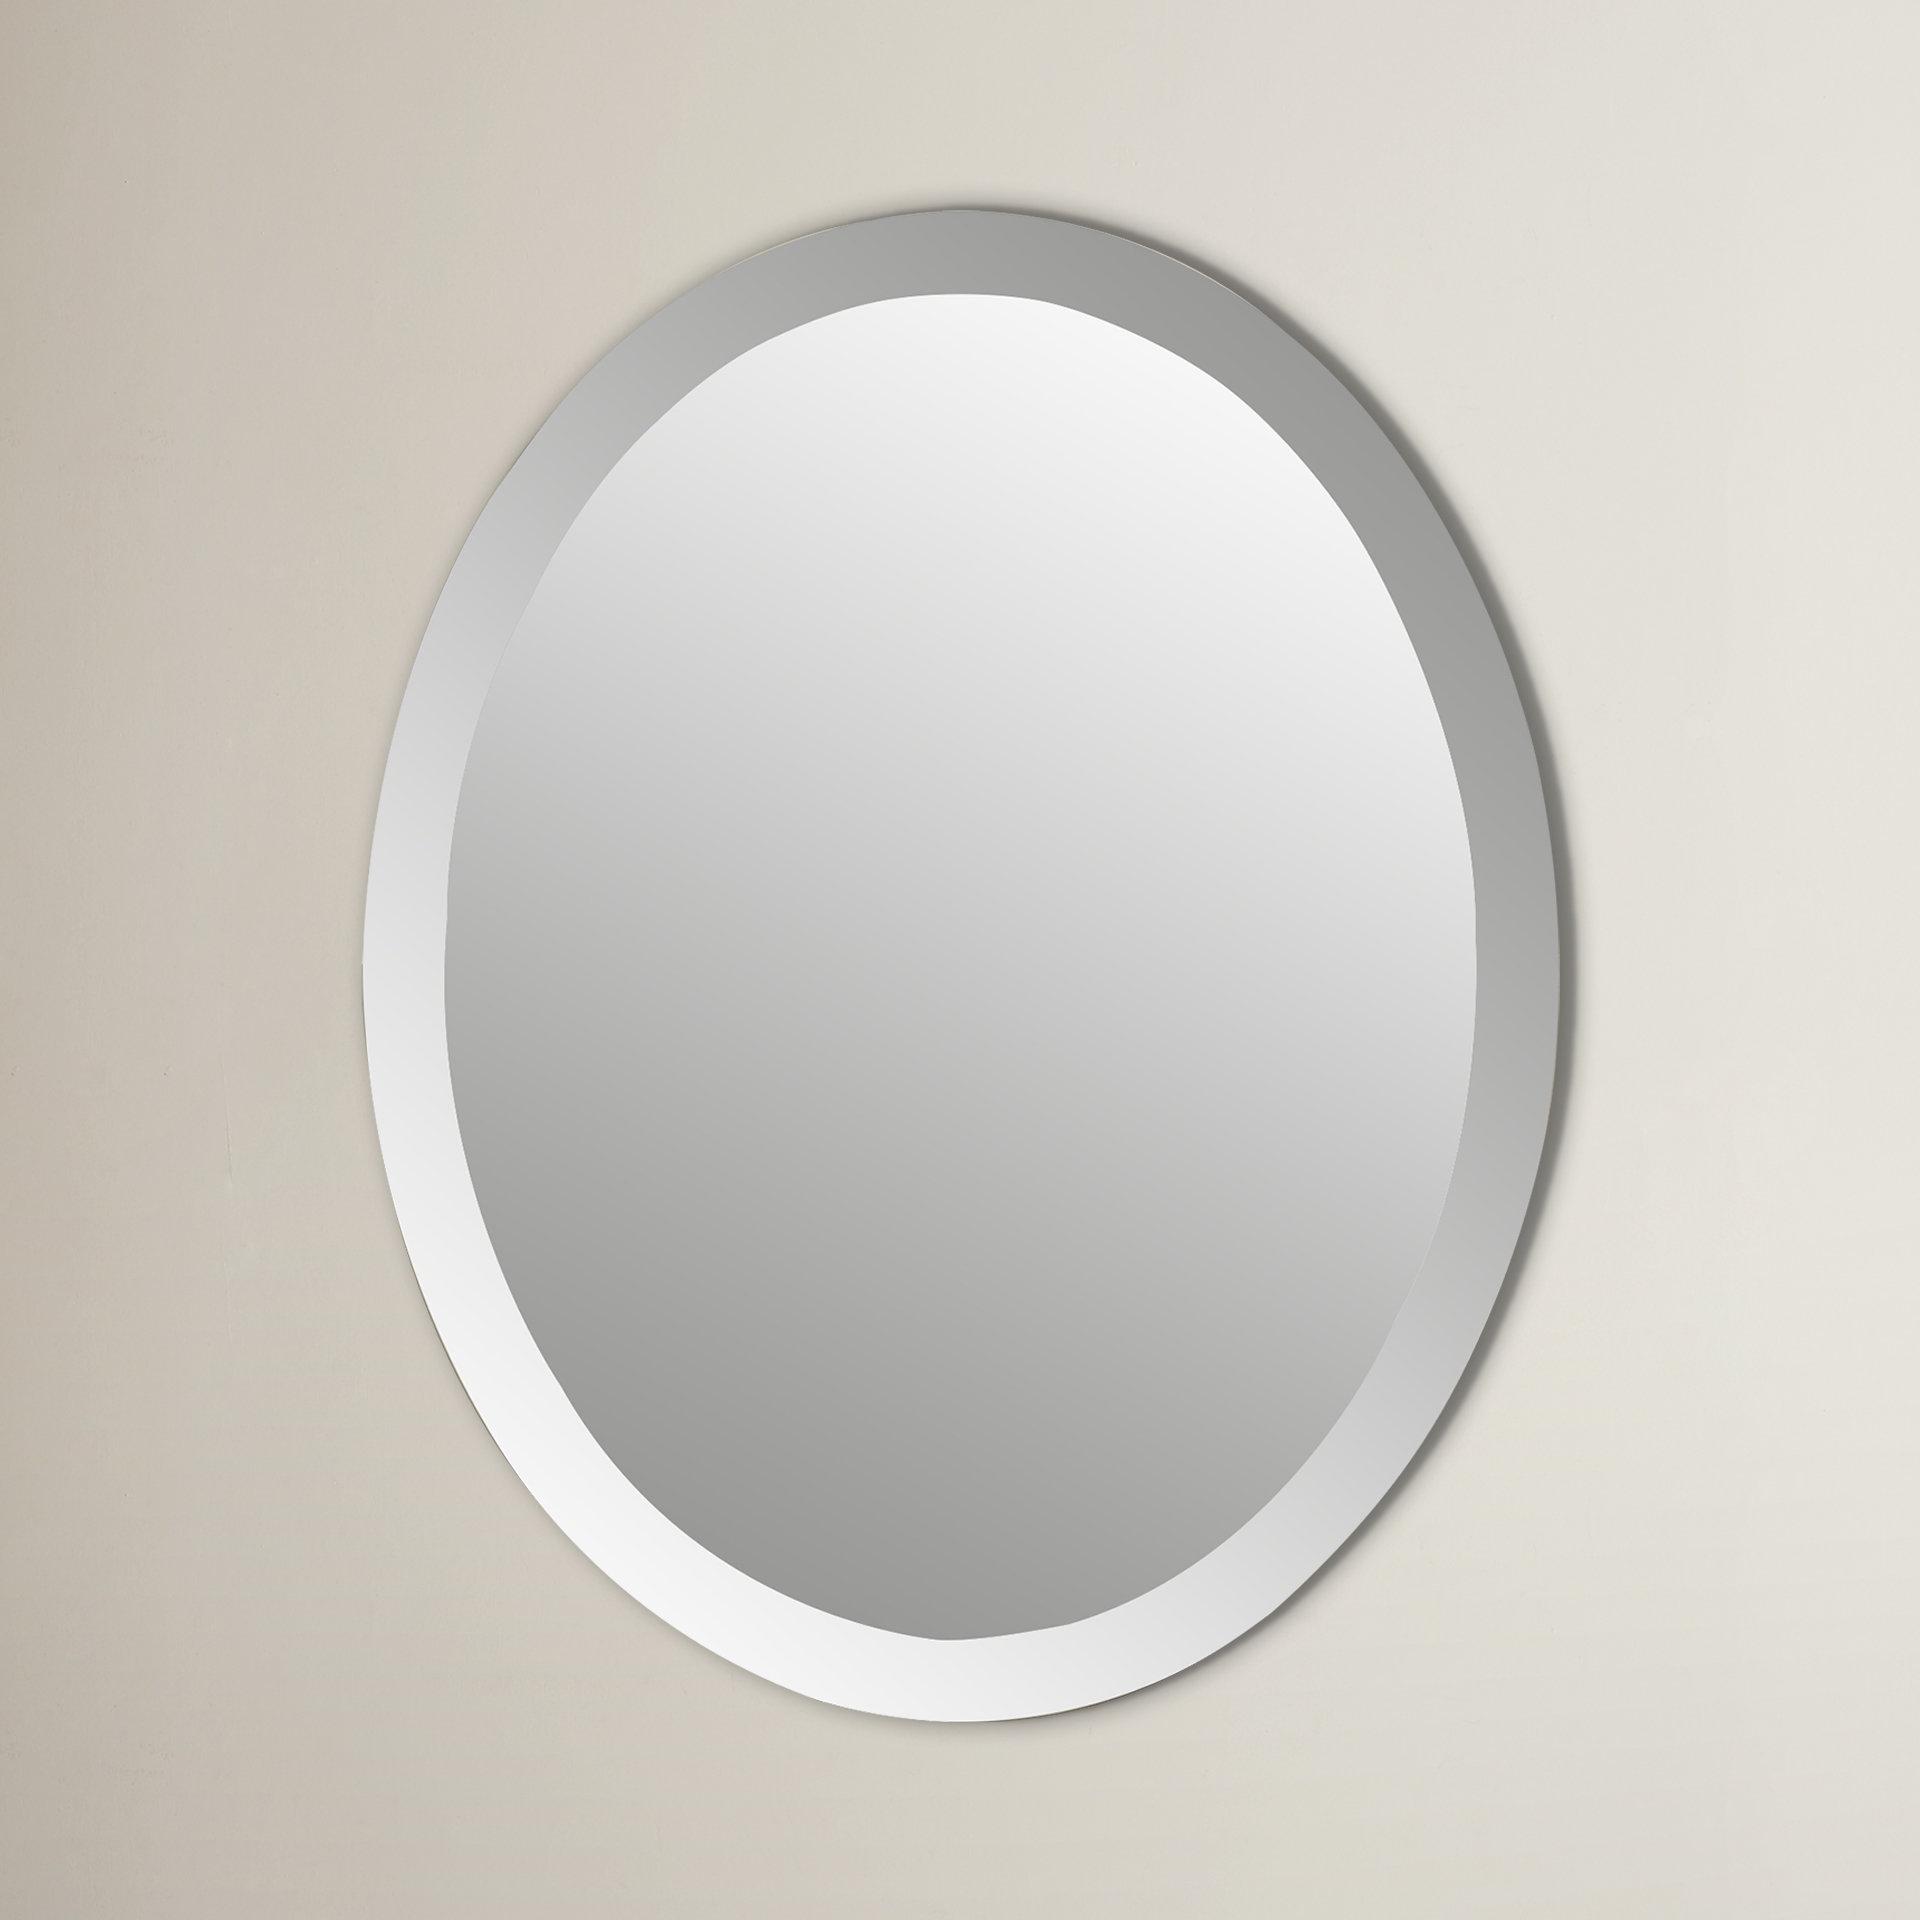 Callison Oval Bevel Frameless Wall Mirror Throughout Logan Frameless Wall Mirrors (View 9 of 20)